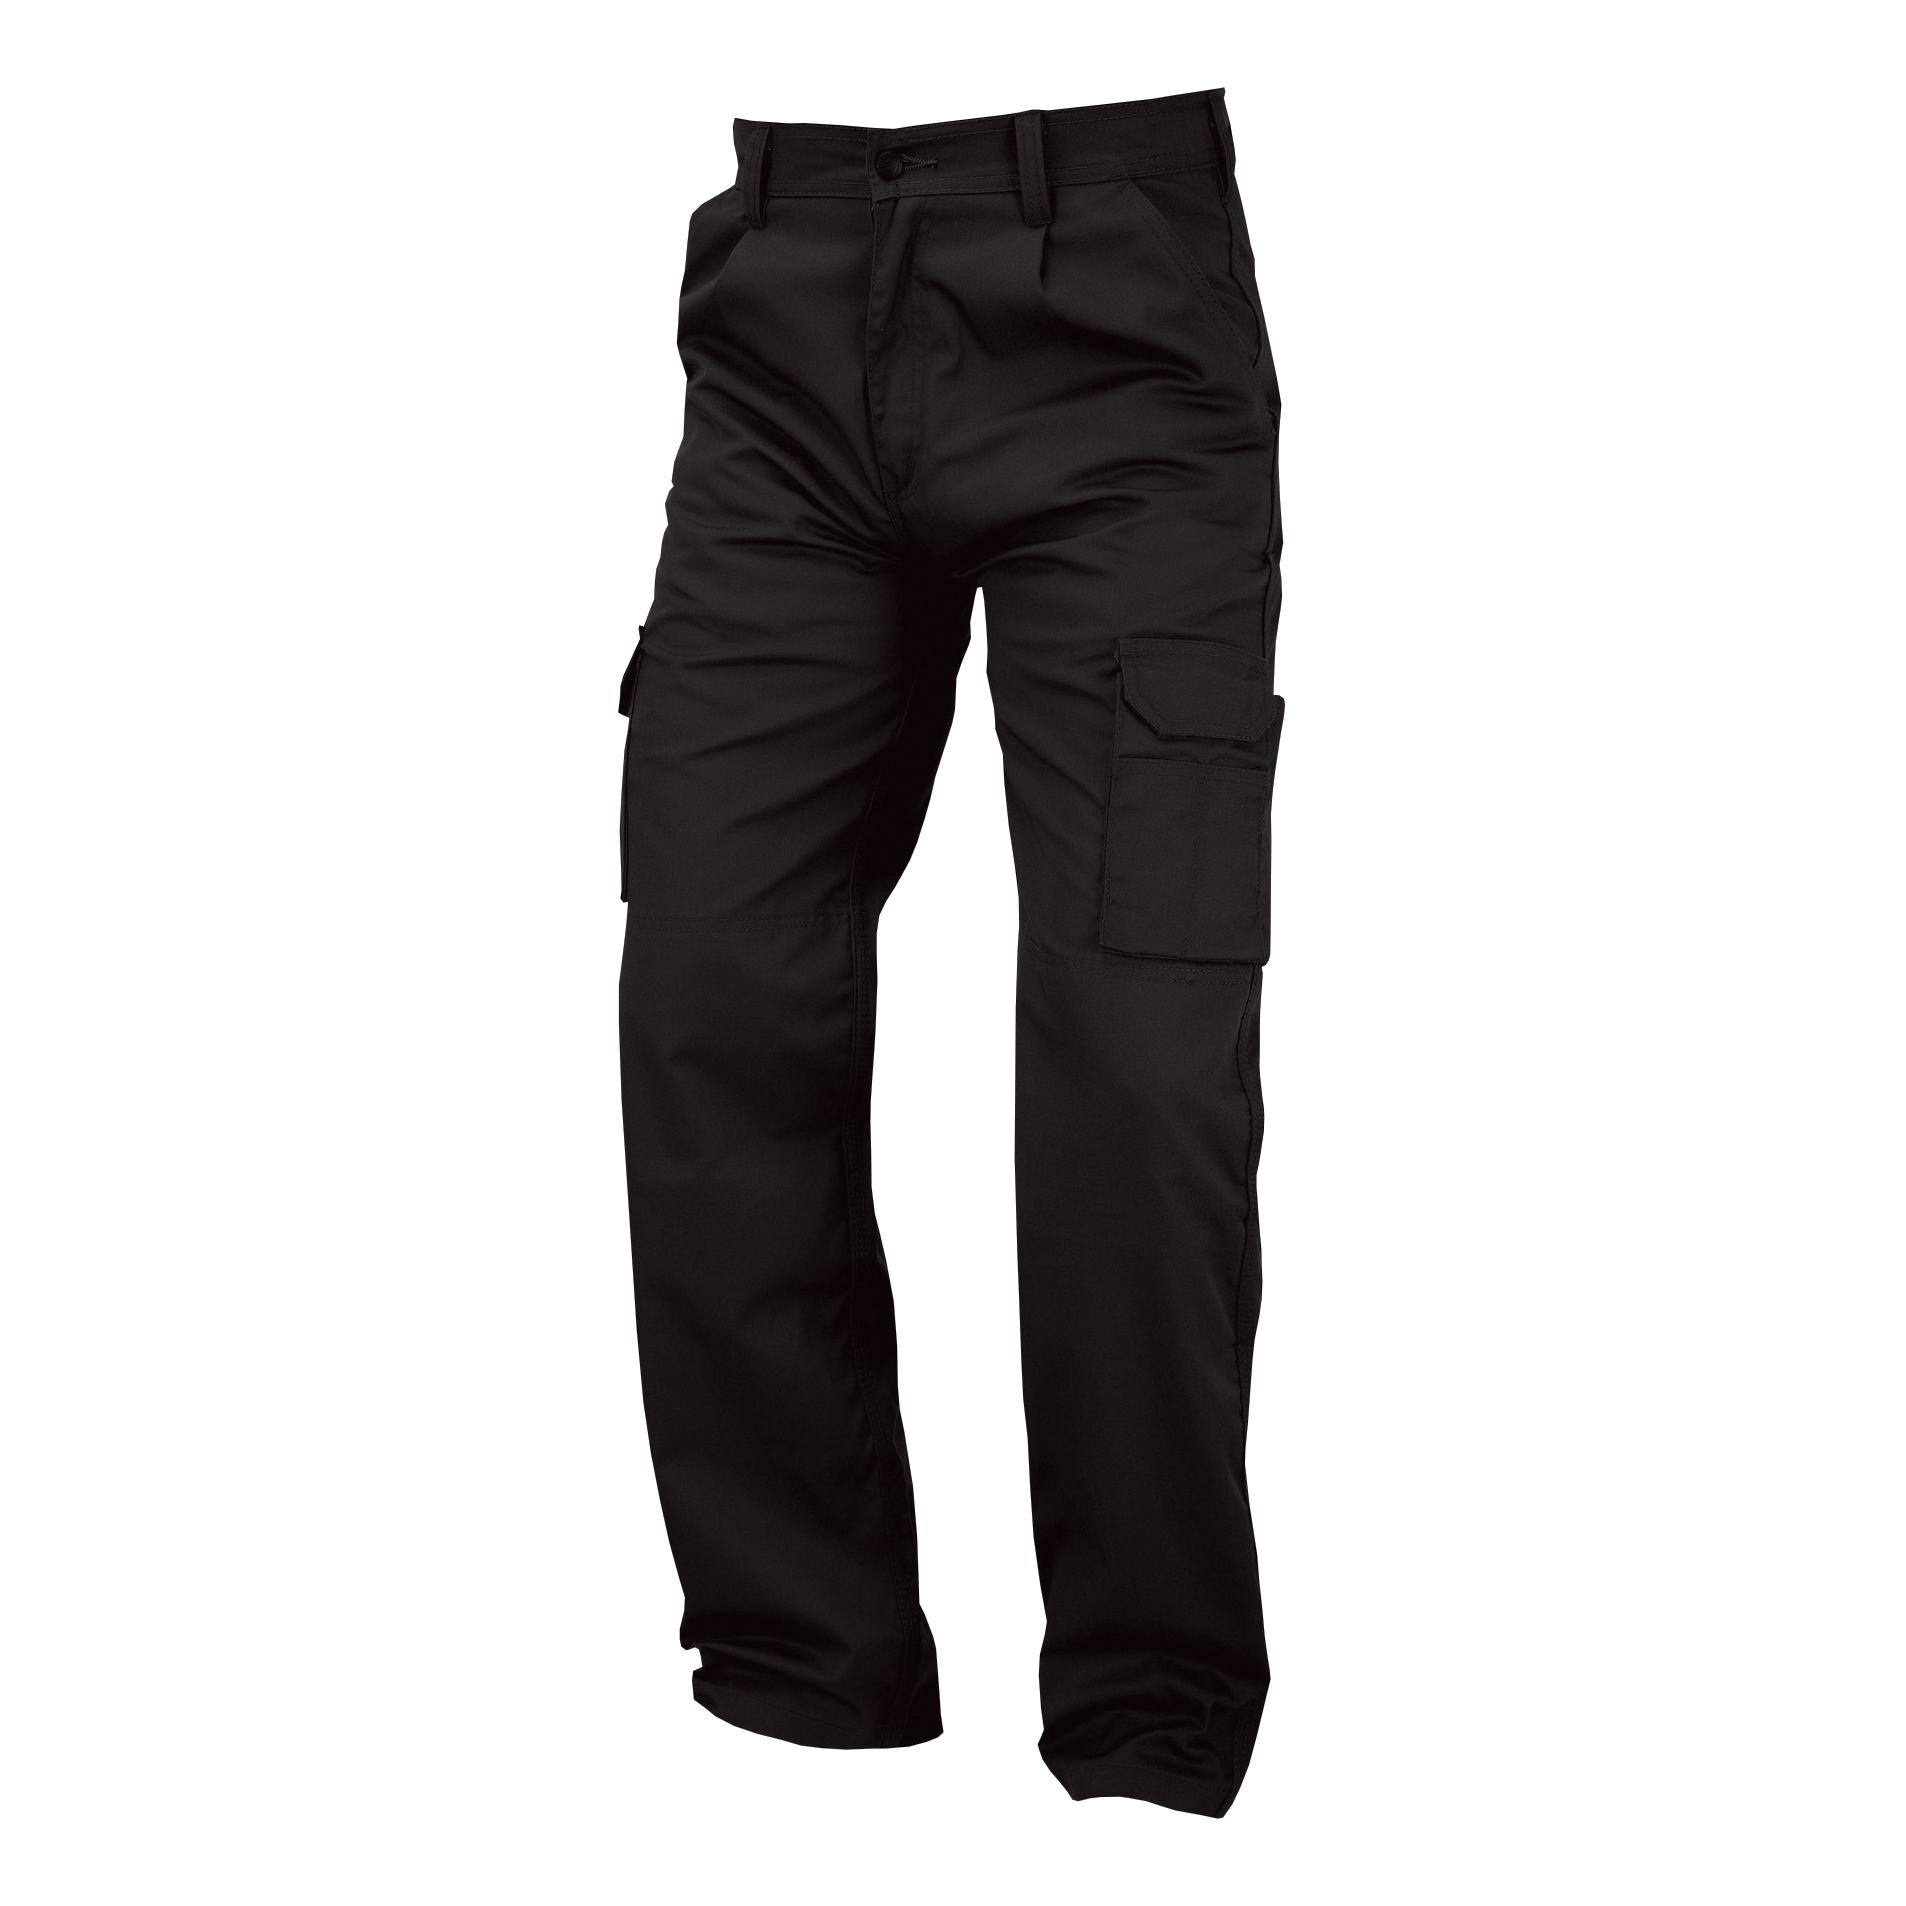 Poly-Cotton Workwear - Super Click Pc Trs Black 44